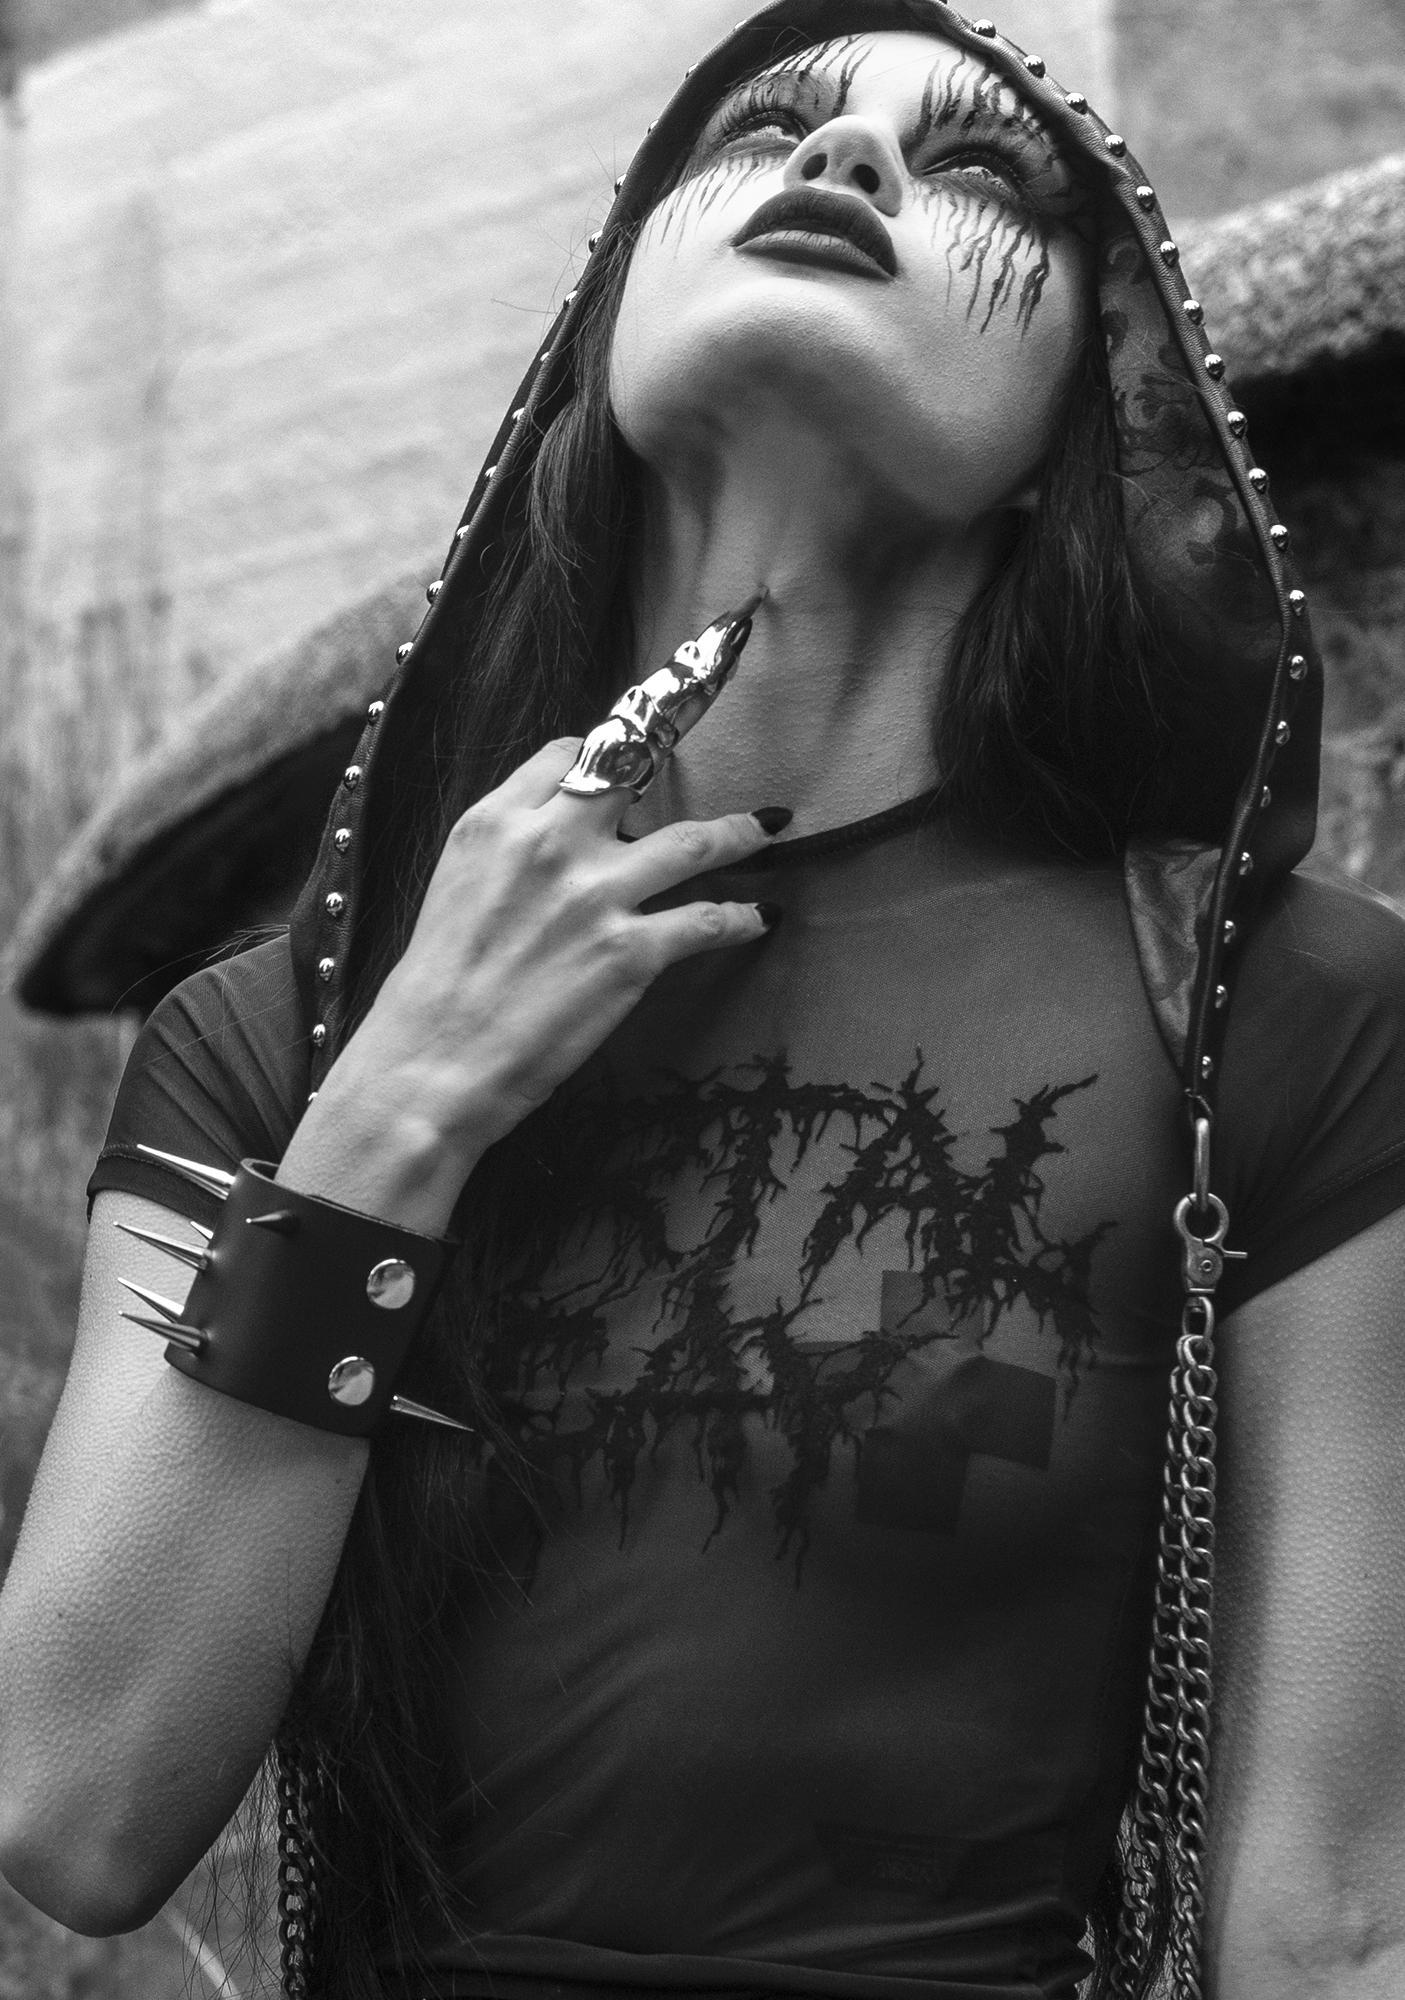 Widow Evil Dimensions Chain Hood